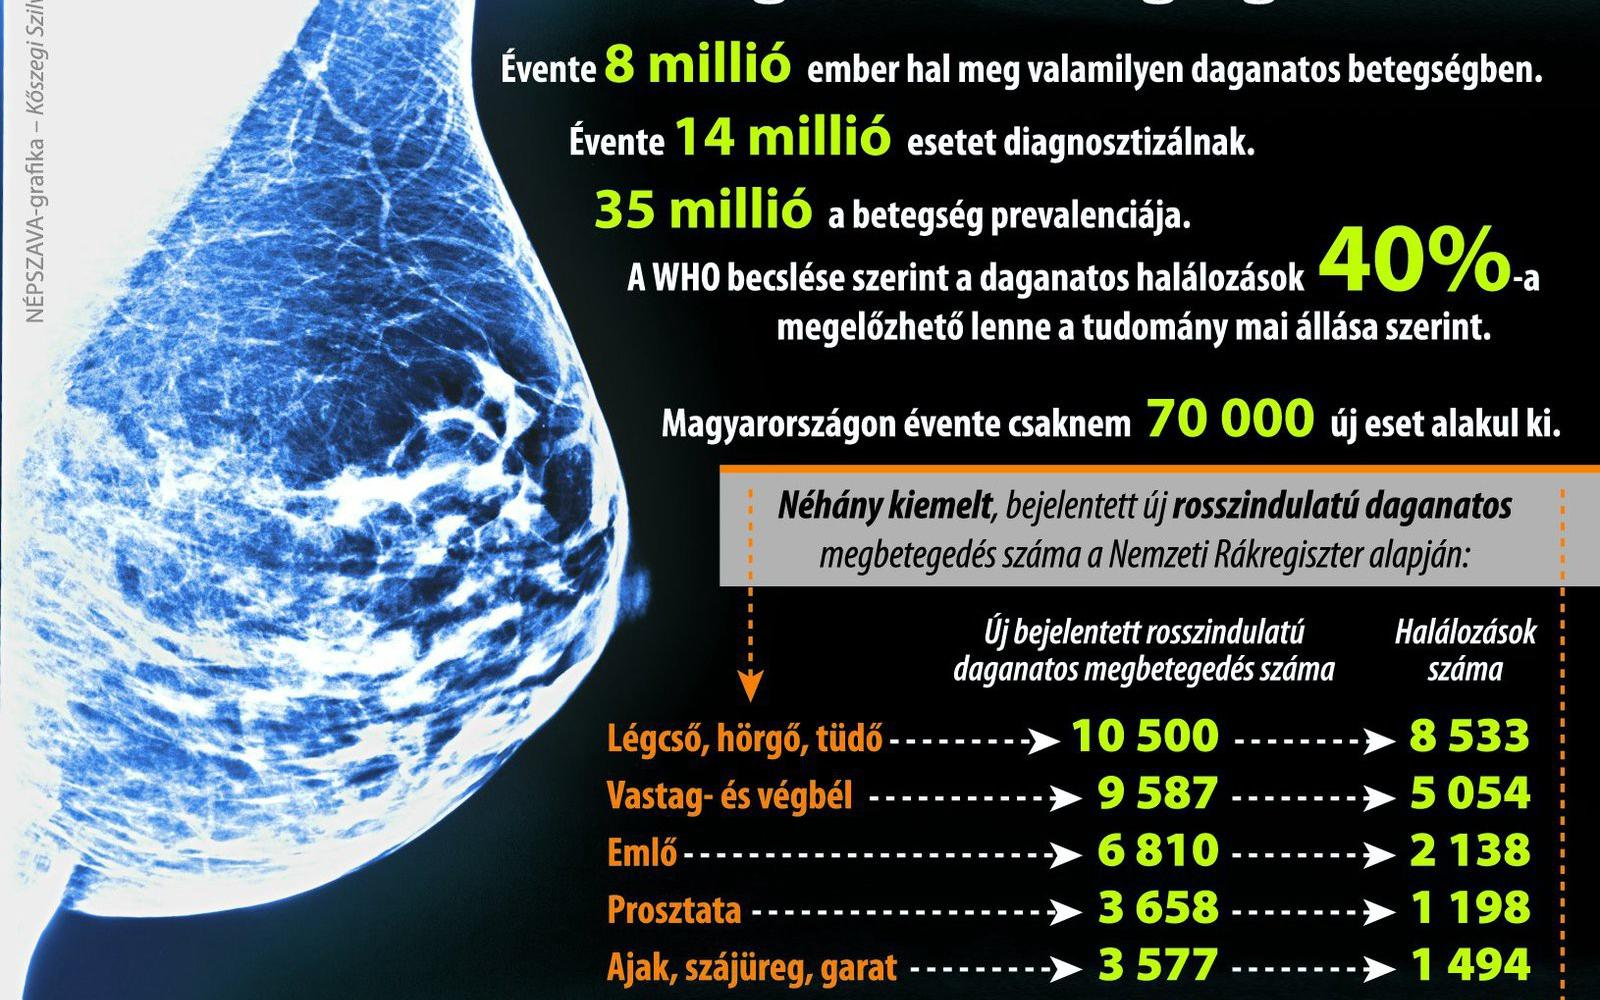 vastagbélrák prevalenciája)